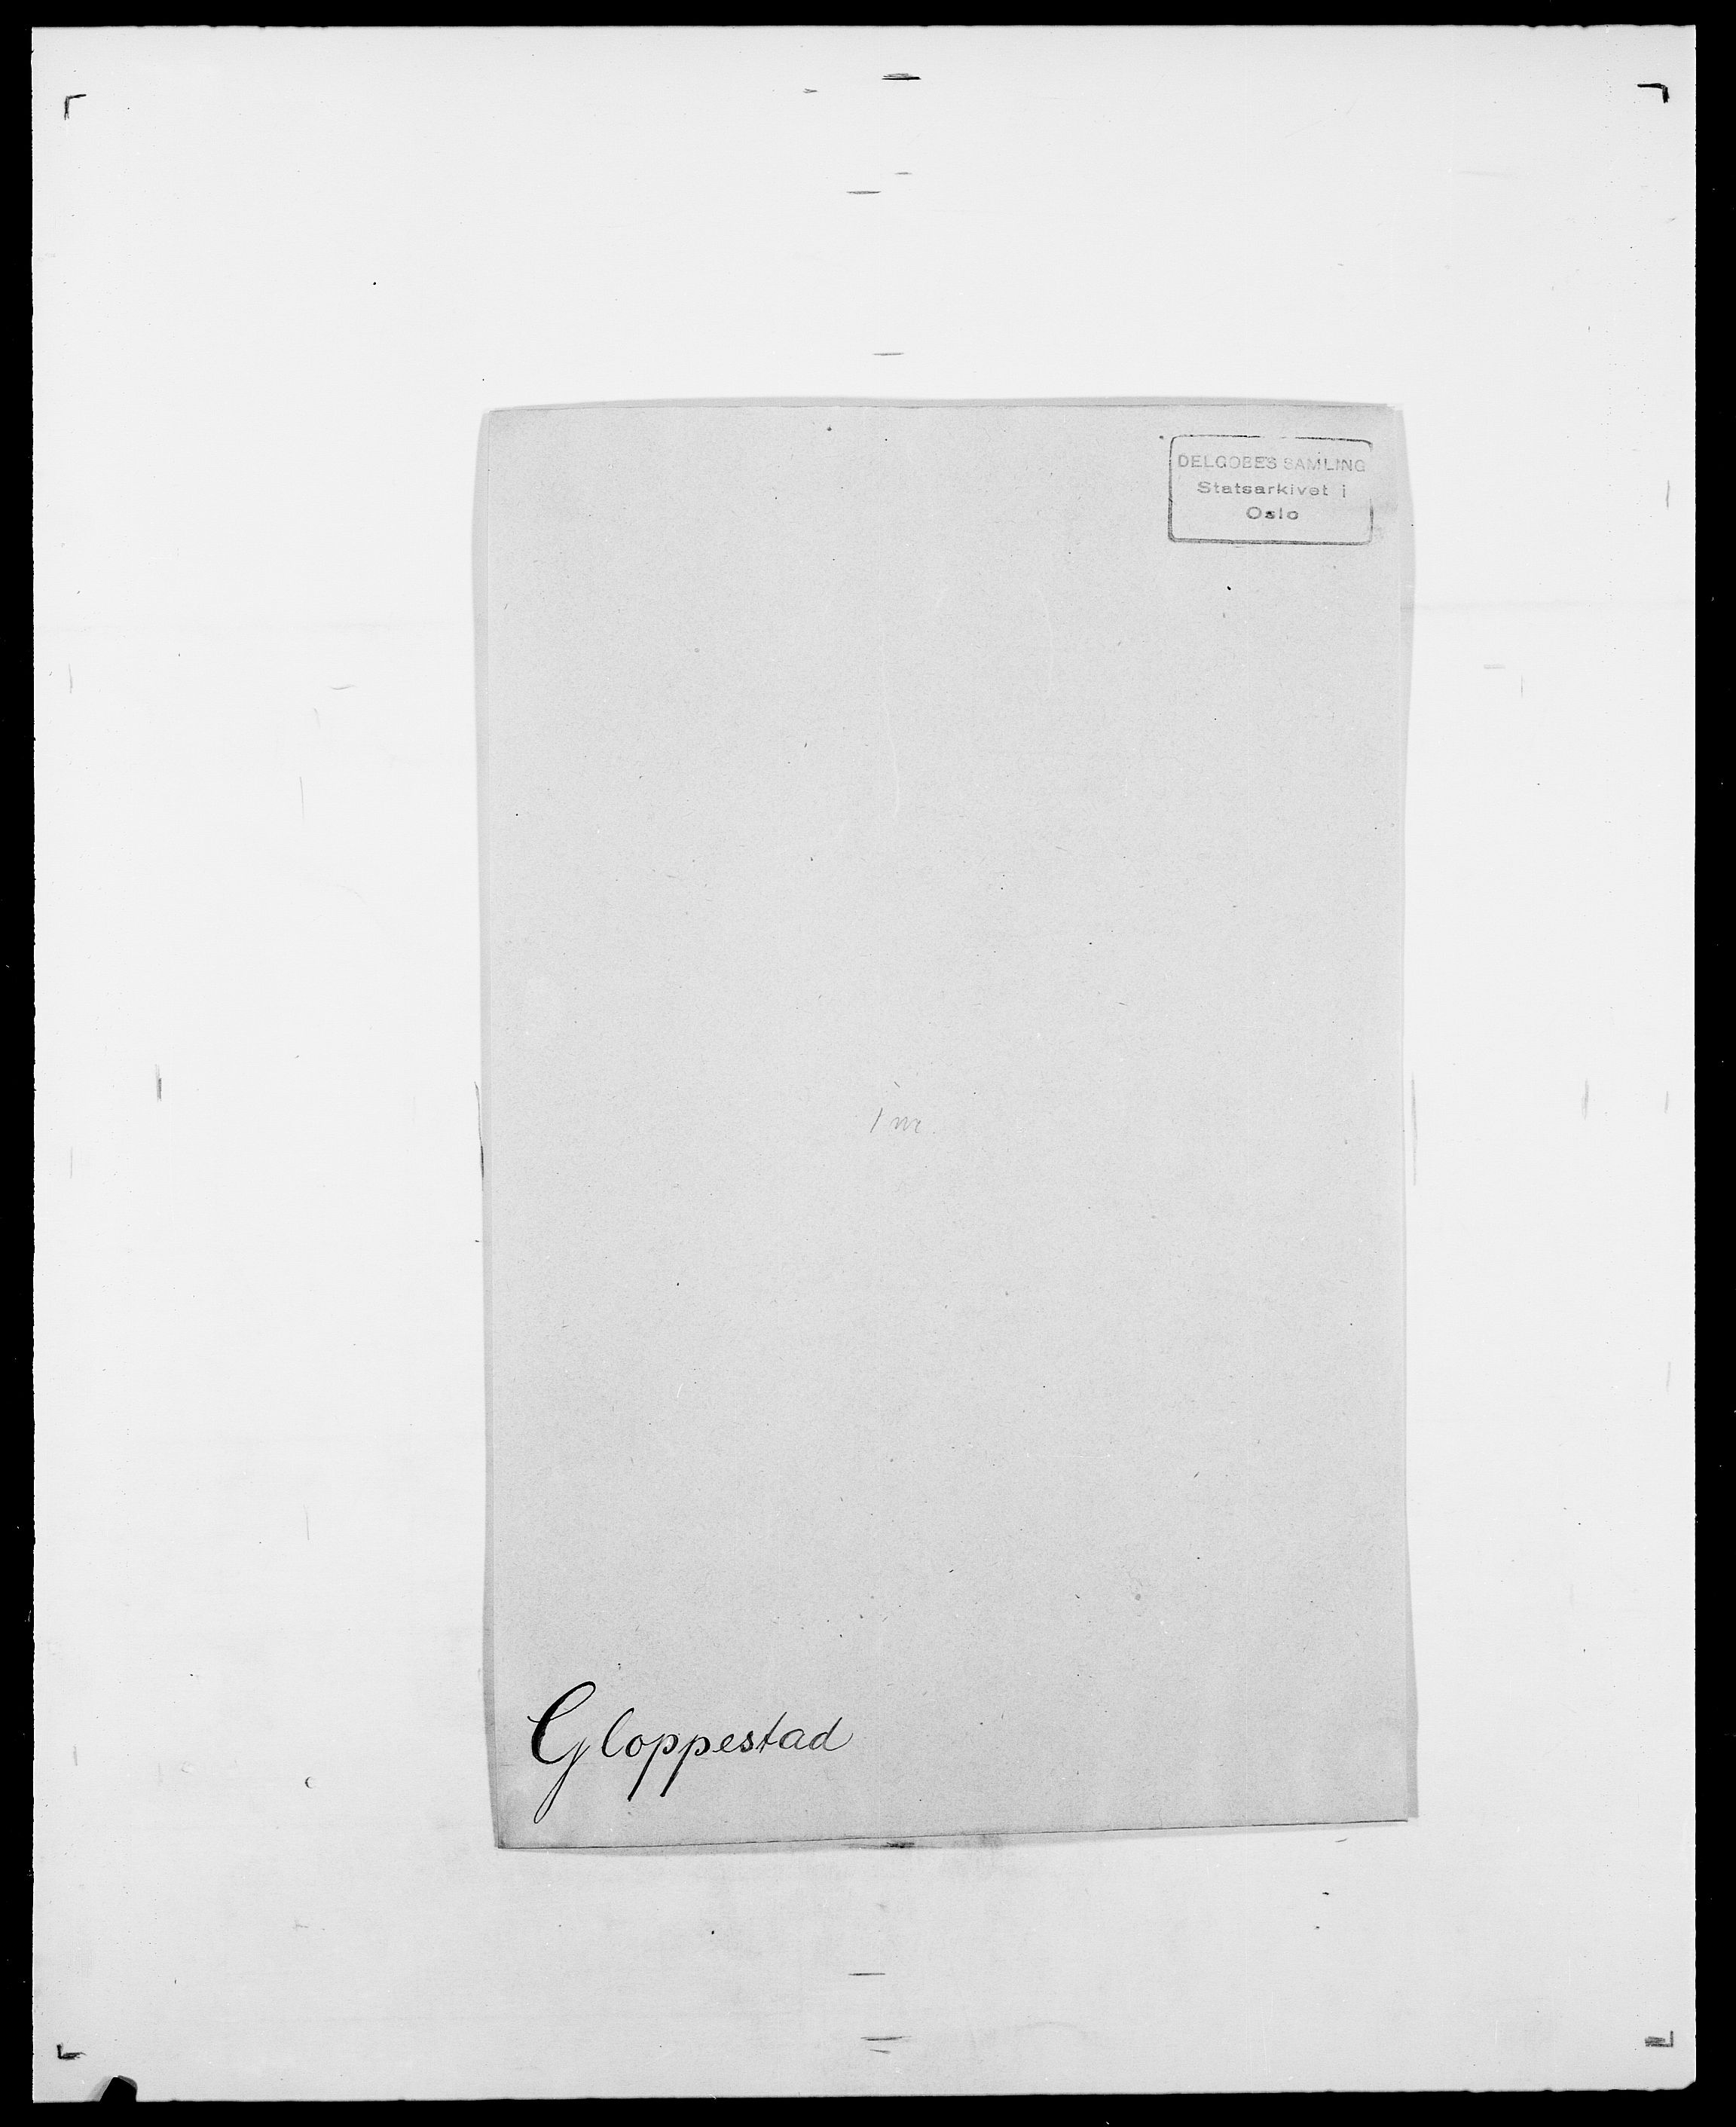 SAO, Delgobe, Charles Antoine - samling, D/Da/L0014: Giebdhausen - Grip, s. 331